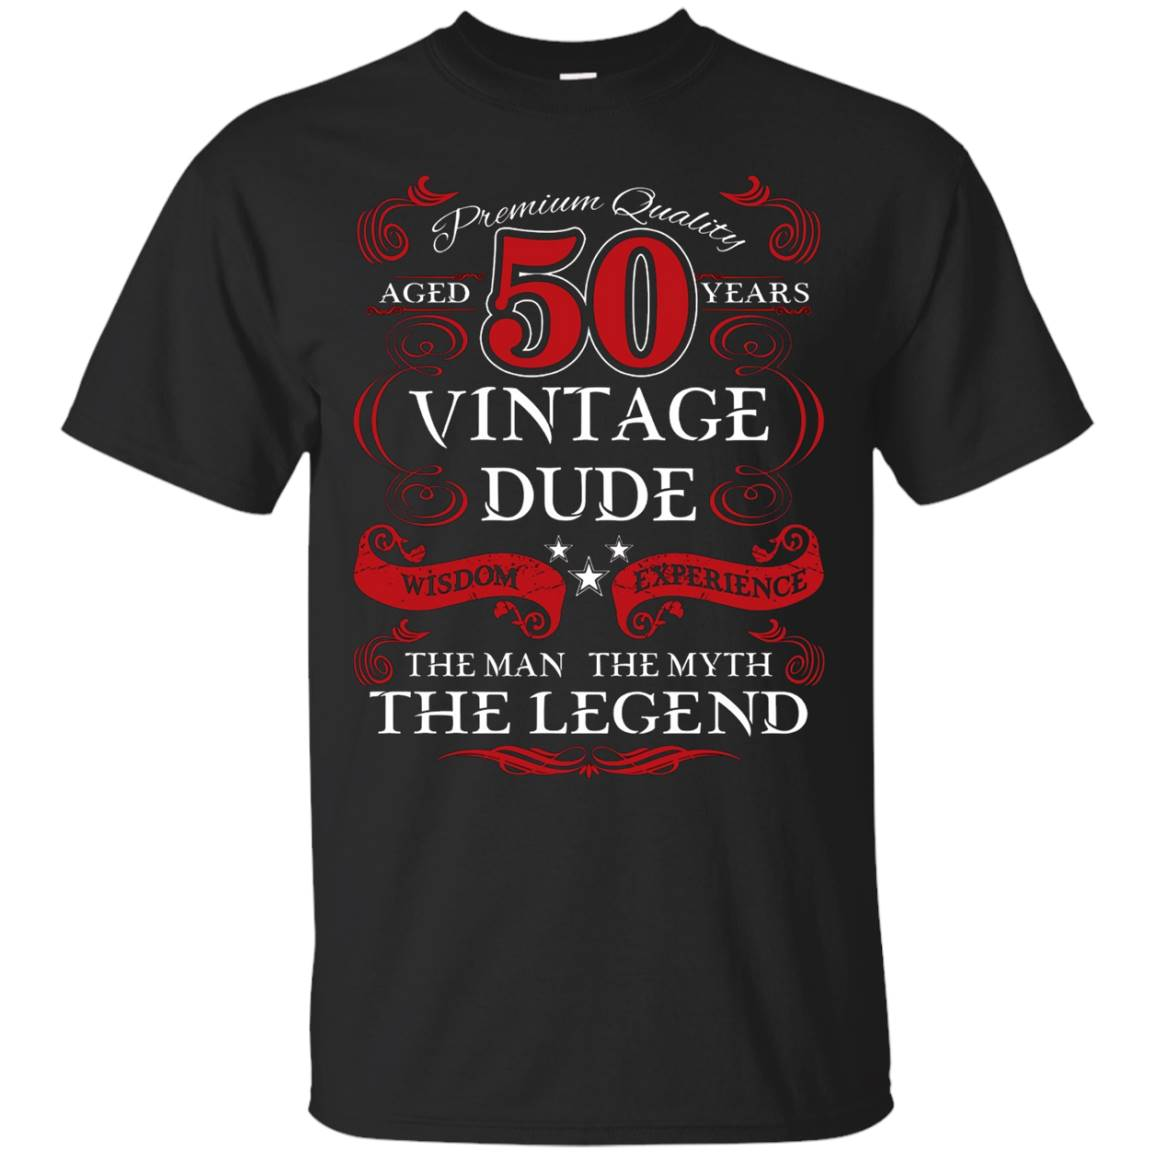 Men's Aged 50 Vintage Dude Man, Myth, Legend Birthday Gift T-Shirt